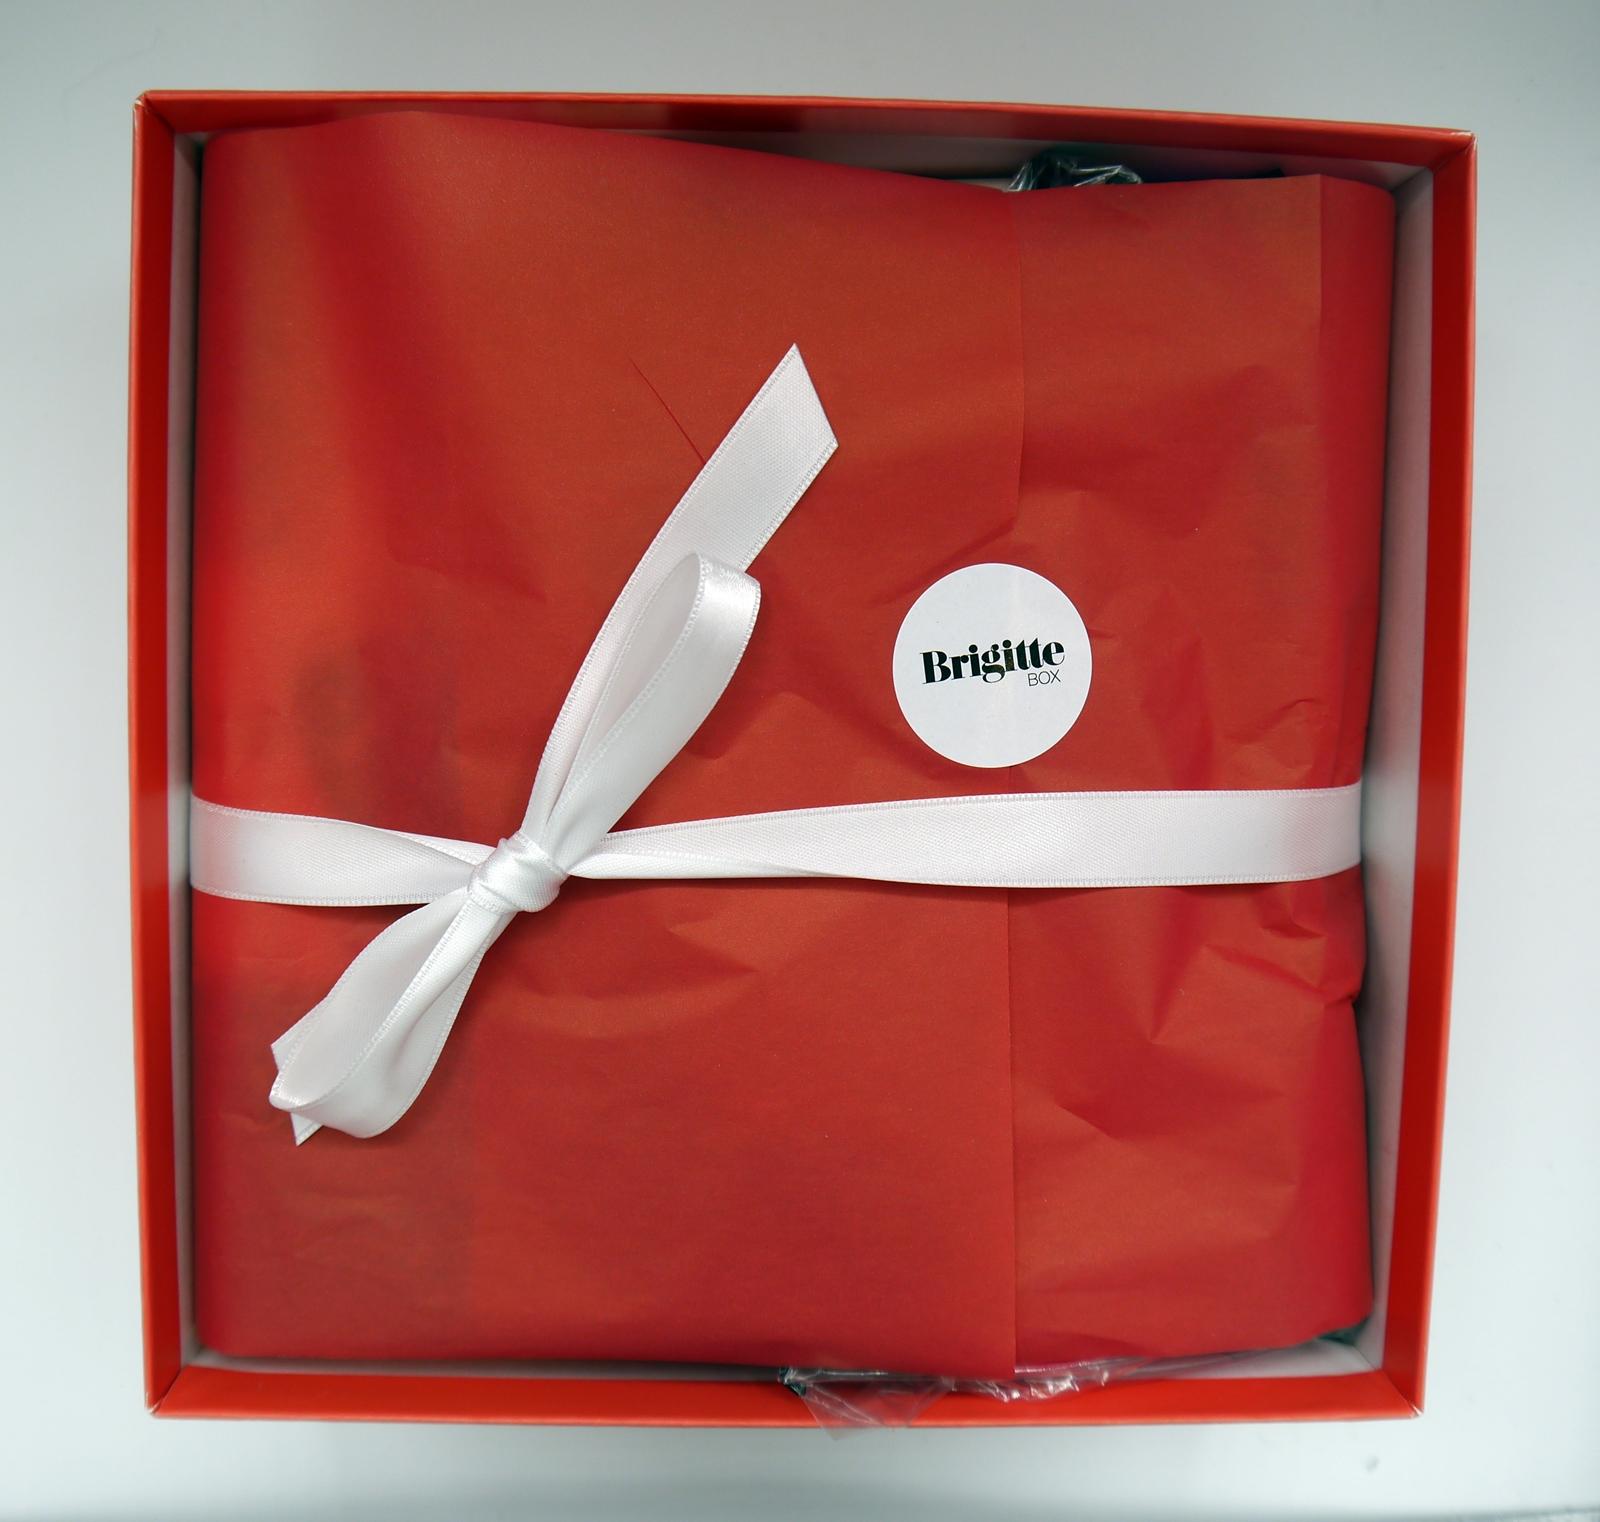 brigitte box februar-maerz 2017 bei zeitlos bezaubernd